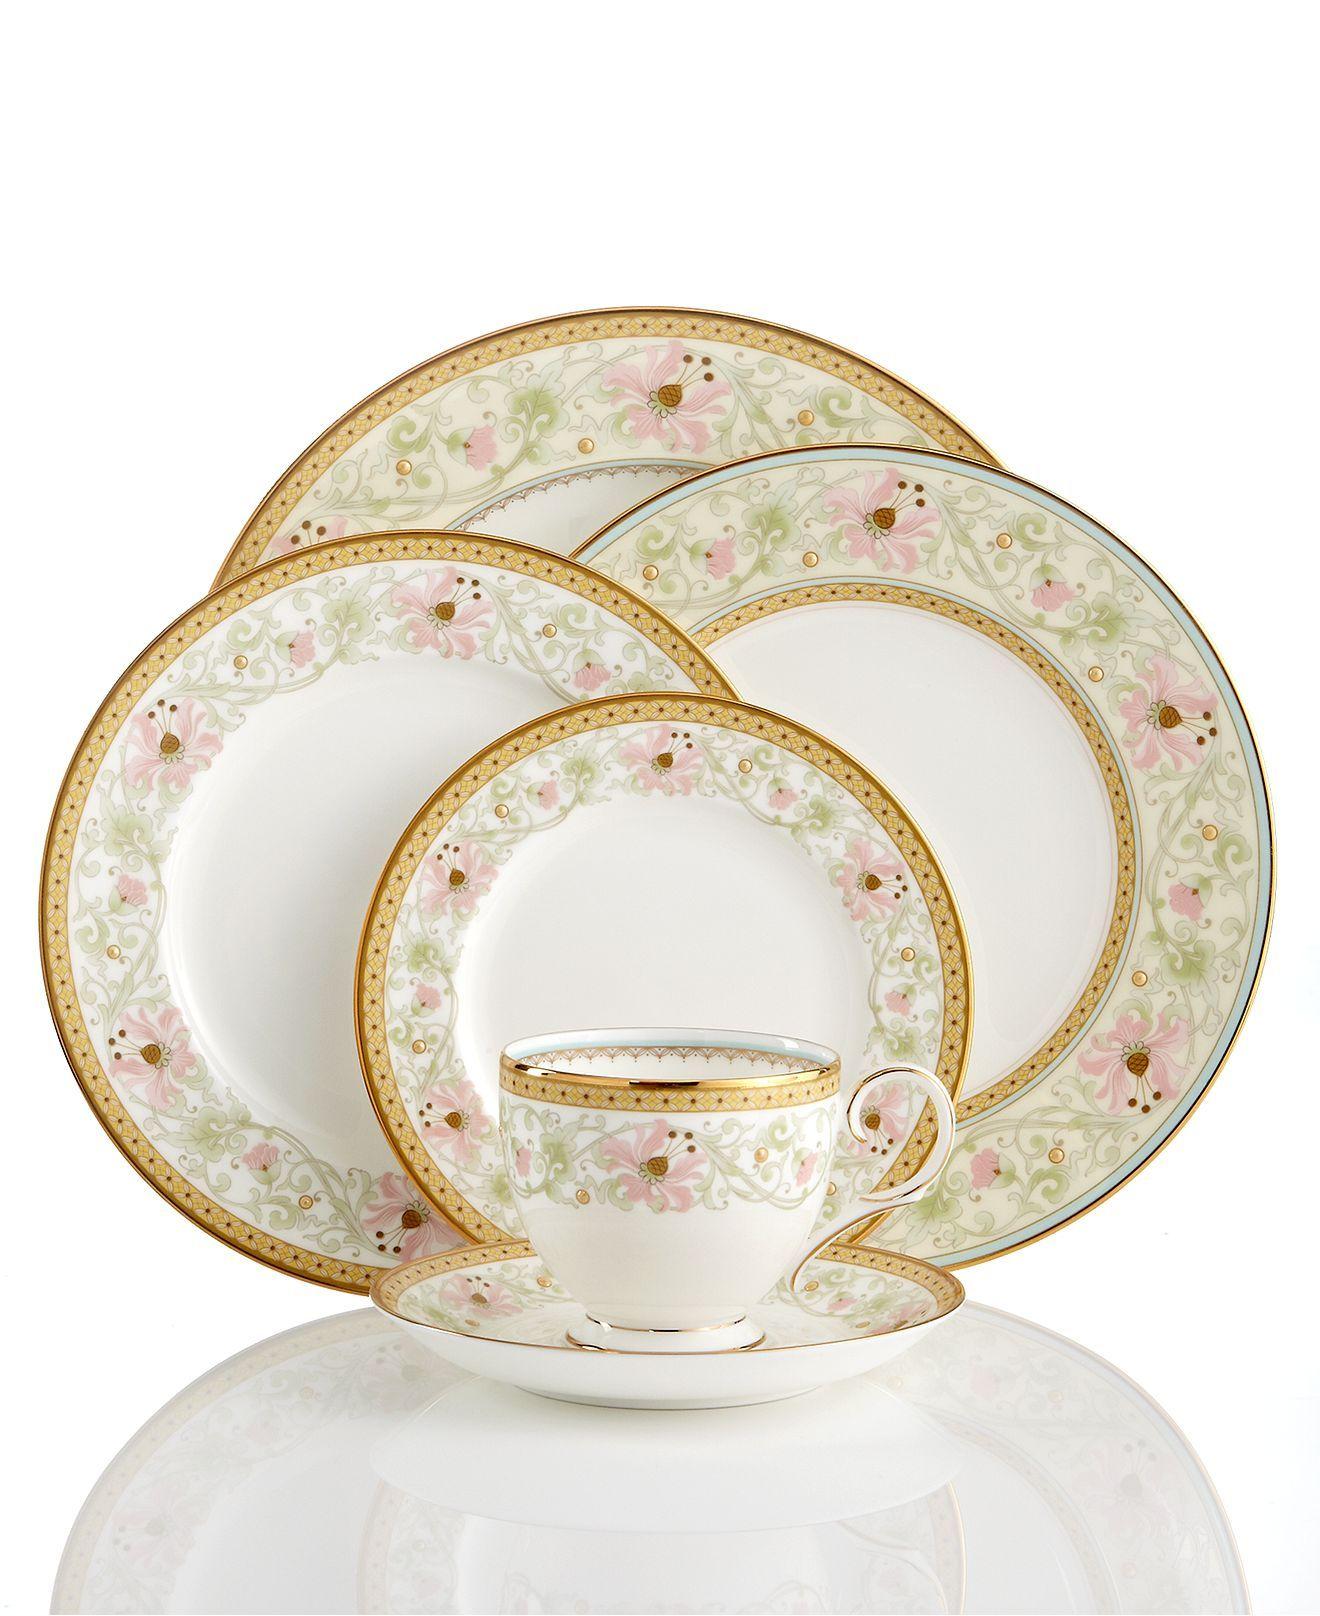 Noritake Dinnerware Blooming Splendor Collection - Fine China - Macy\u0027s  sc 1 st  Pinterest & Noritake Dinnerware Blooming Splendor Collection - Fine China ...